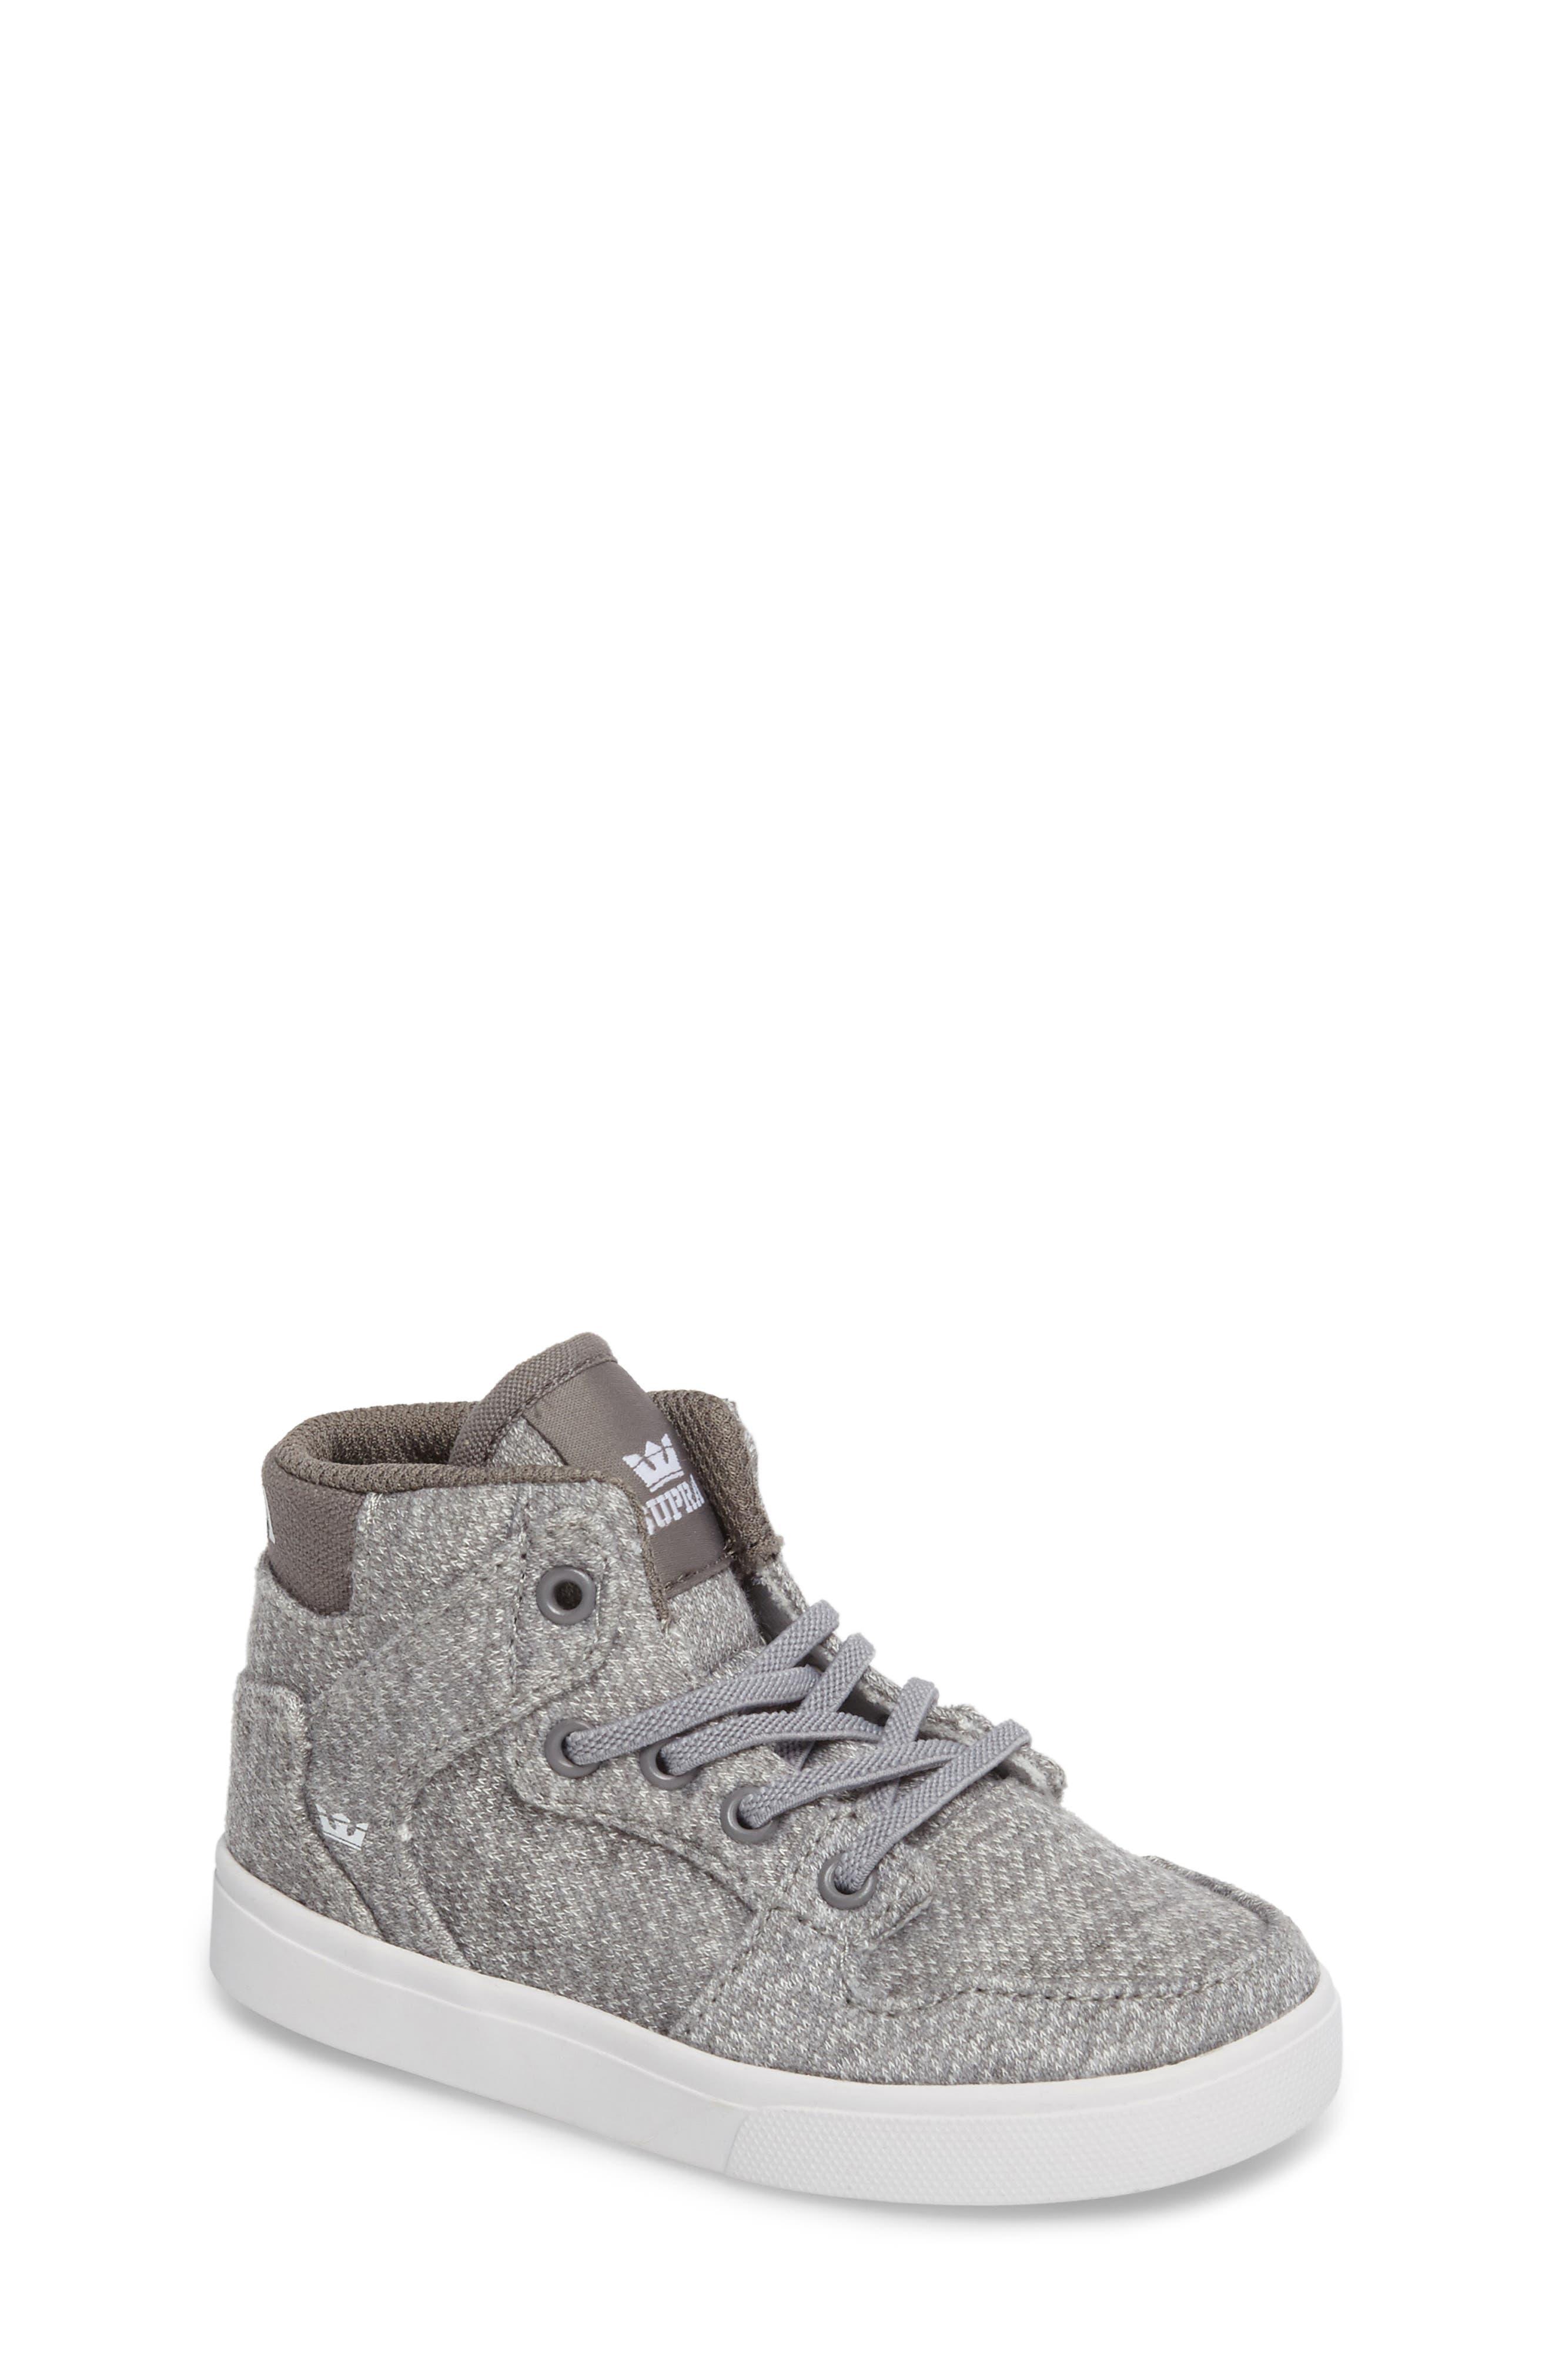 'Vaider' High Top Sneaker,                         Main,                         color, Silver